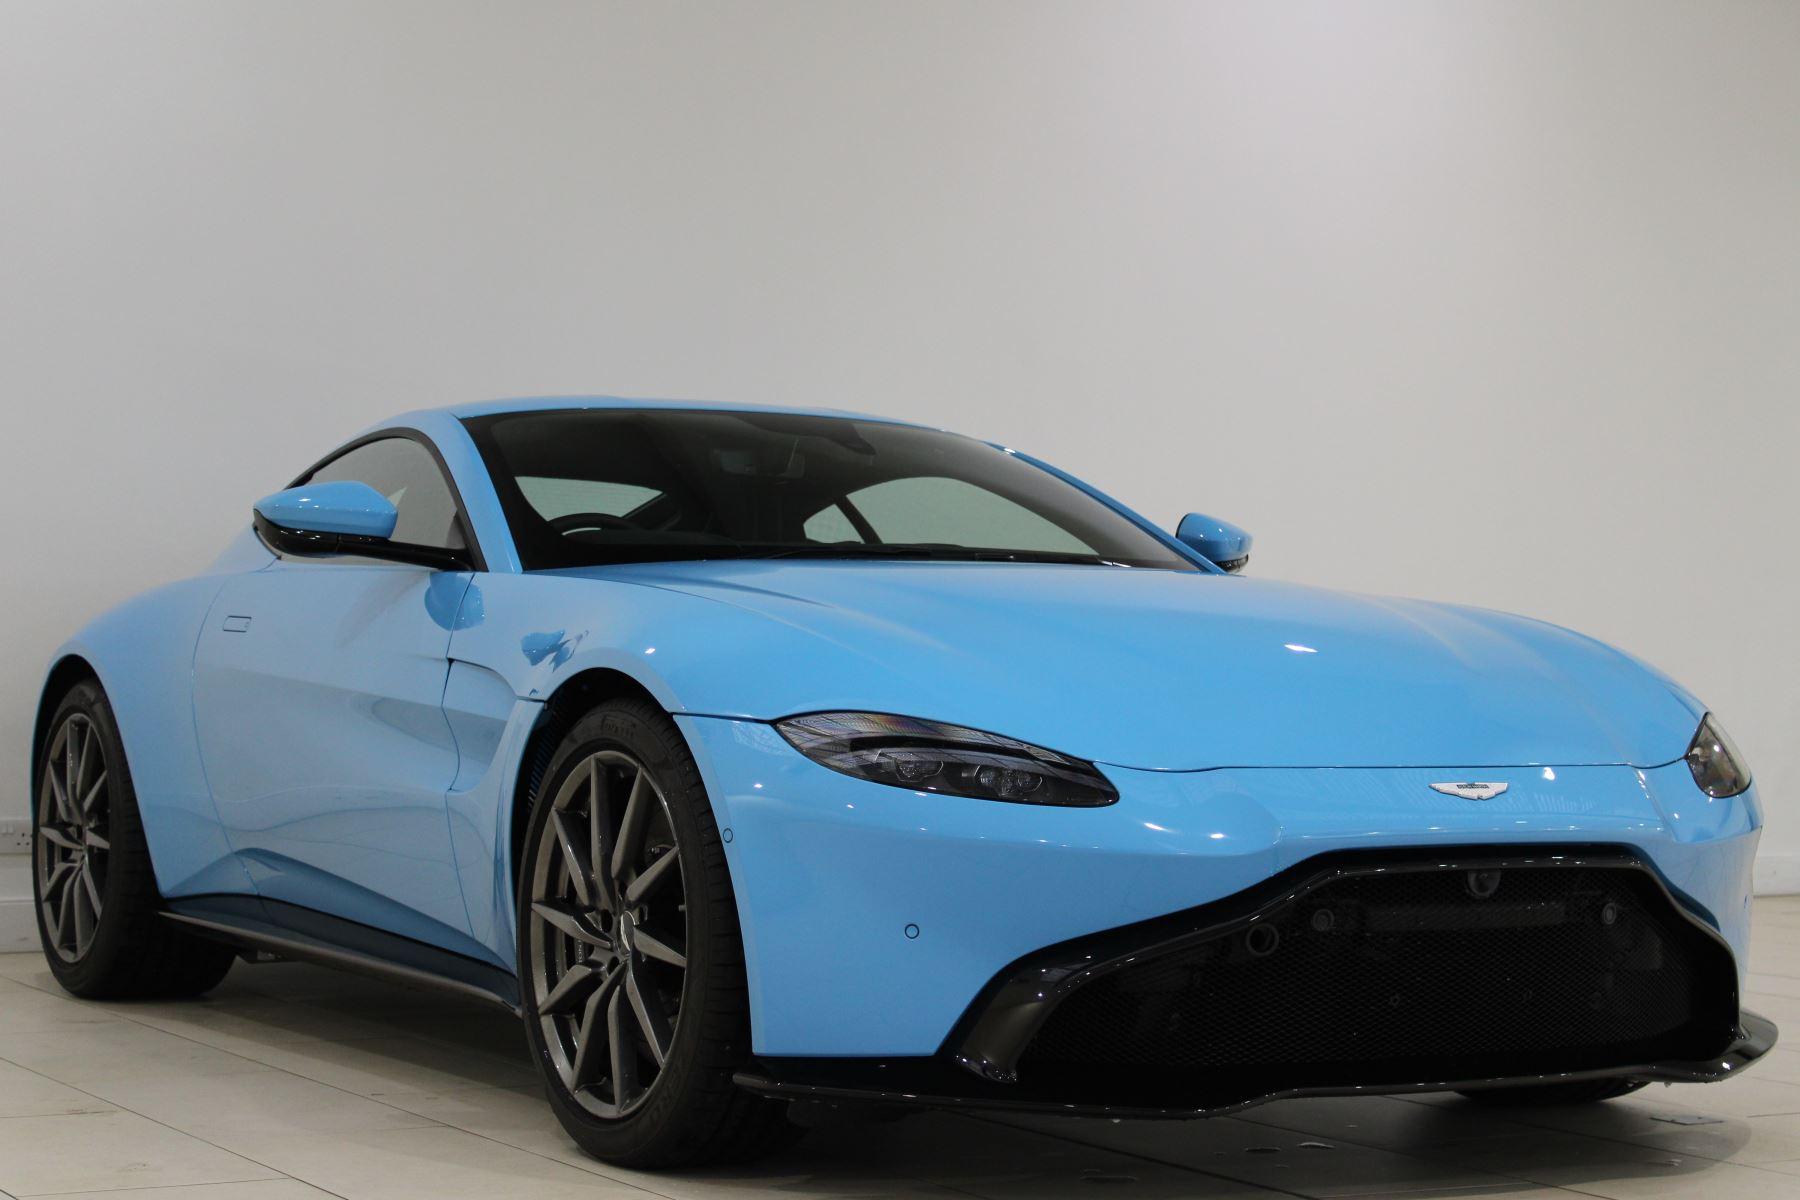 Aston Martin New Vantage 2dr image 4